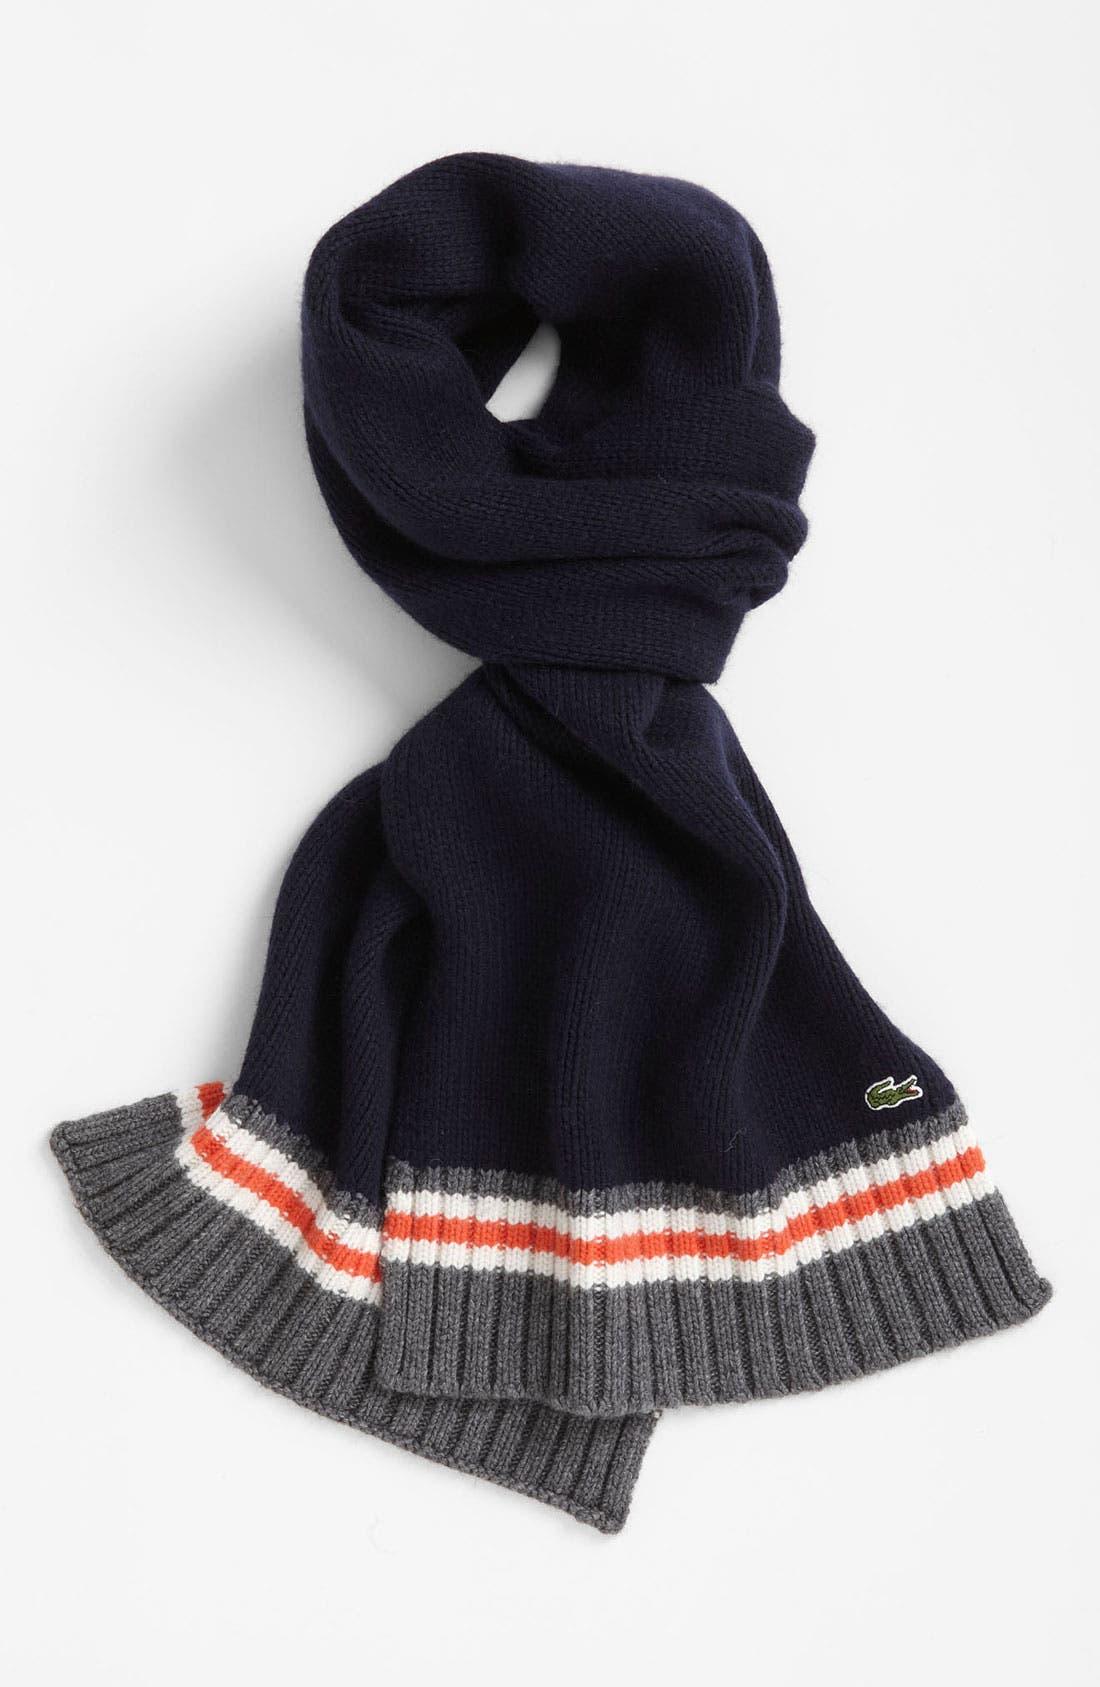 Alternate Image 1 Selected - Lacoste 'Toboggan' Knit Scarf